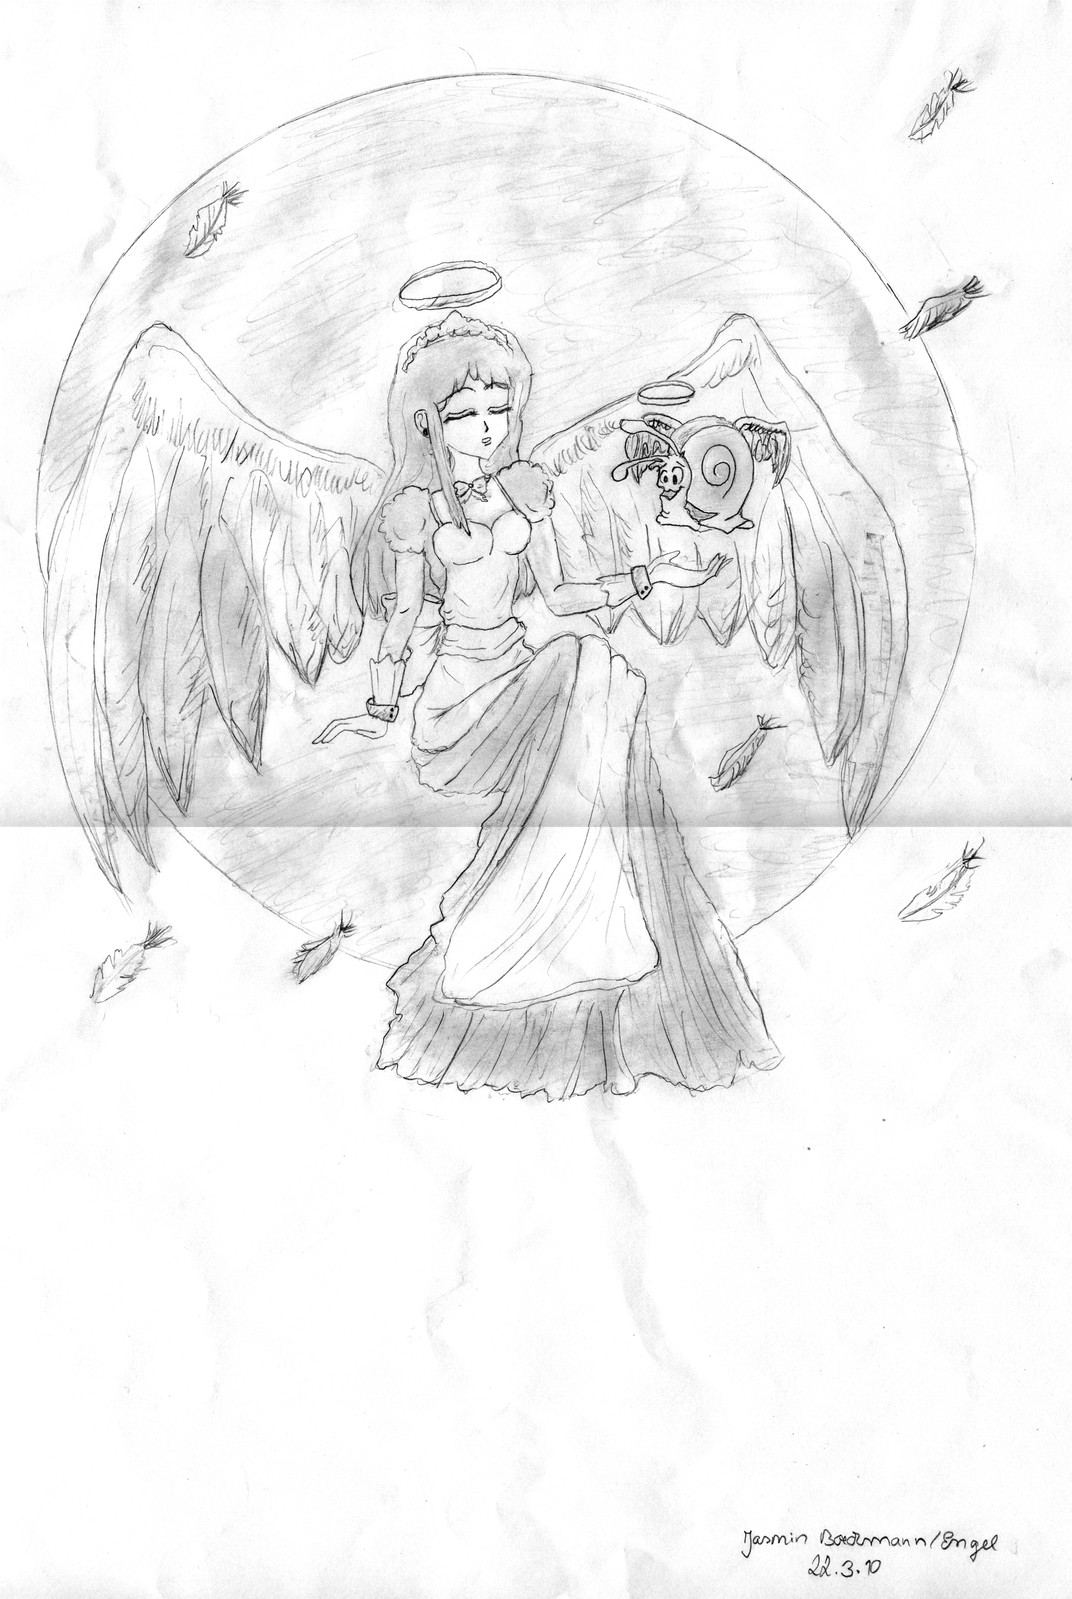 wiemaikai_fanartwettbewerb_2010_jasmin_b